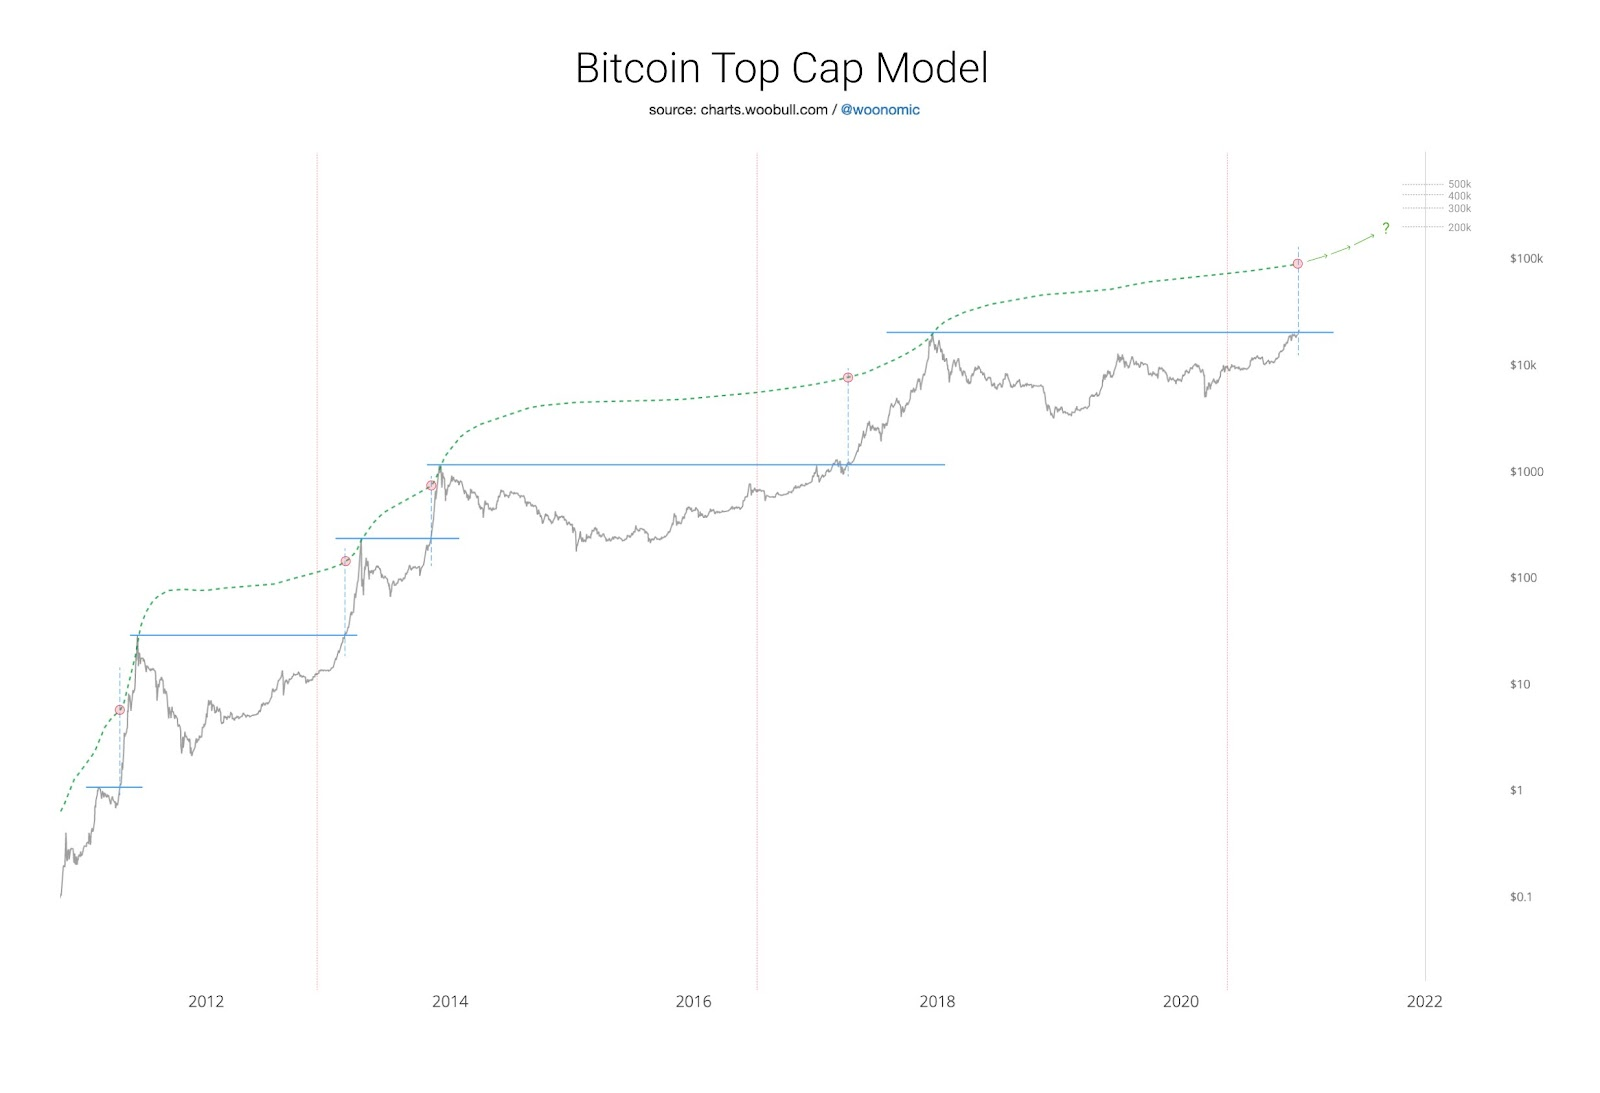 График ВТС по модели Вилли Ву.